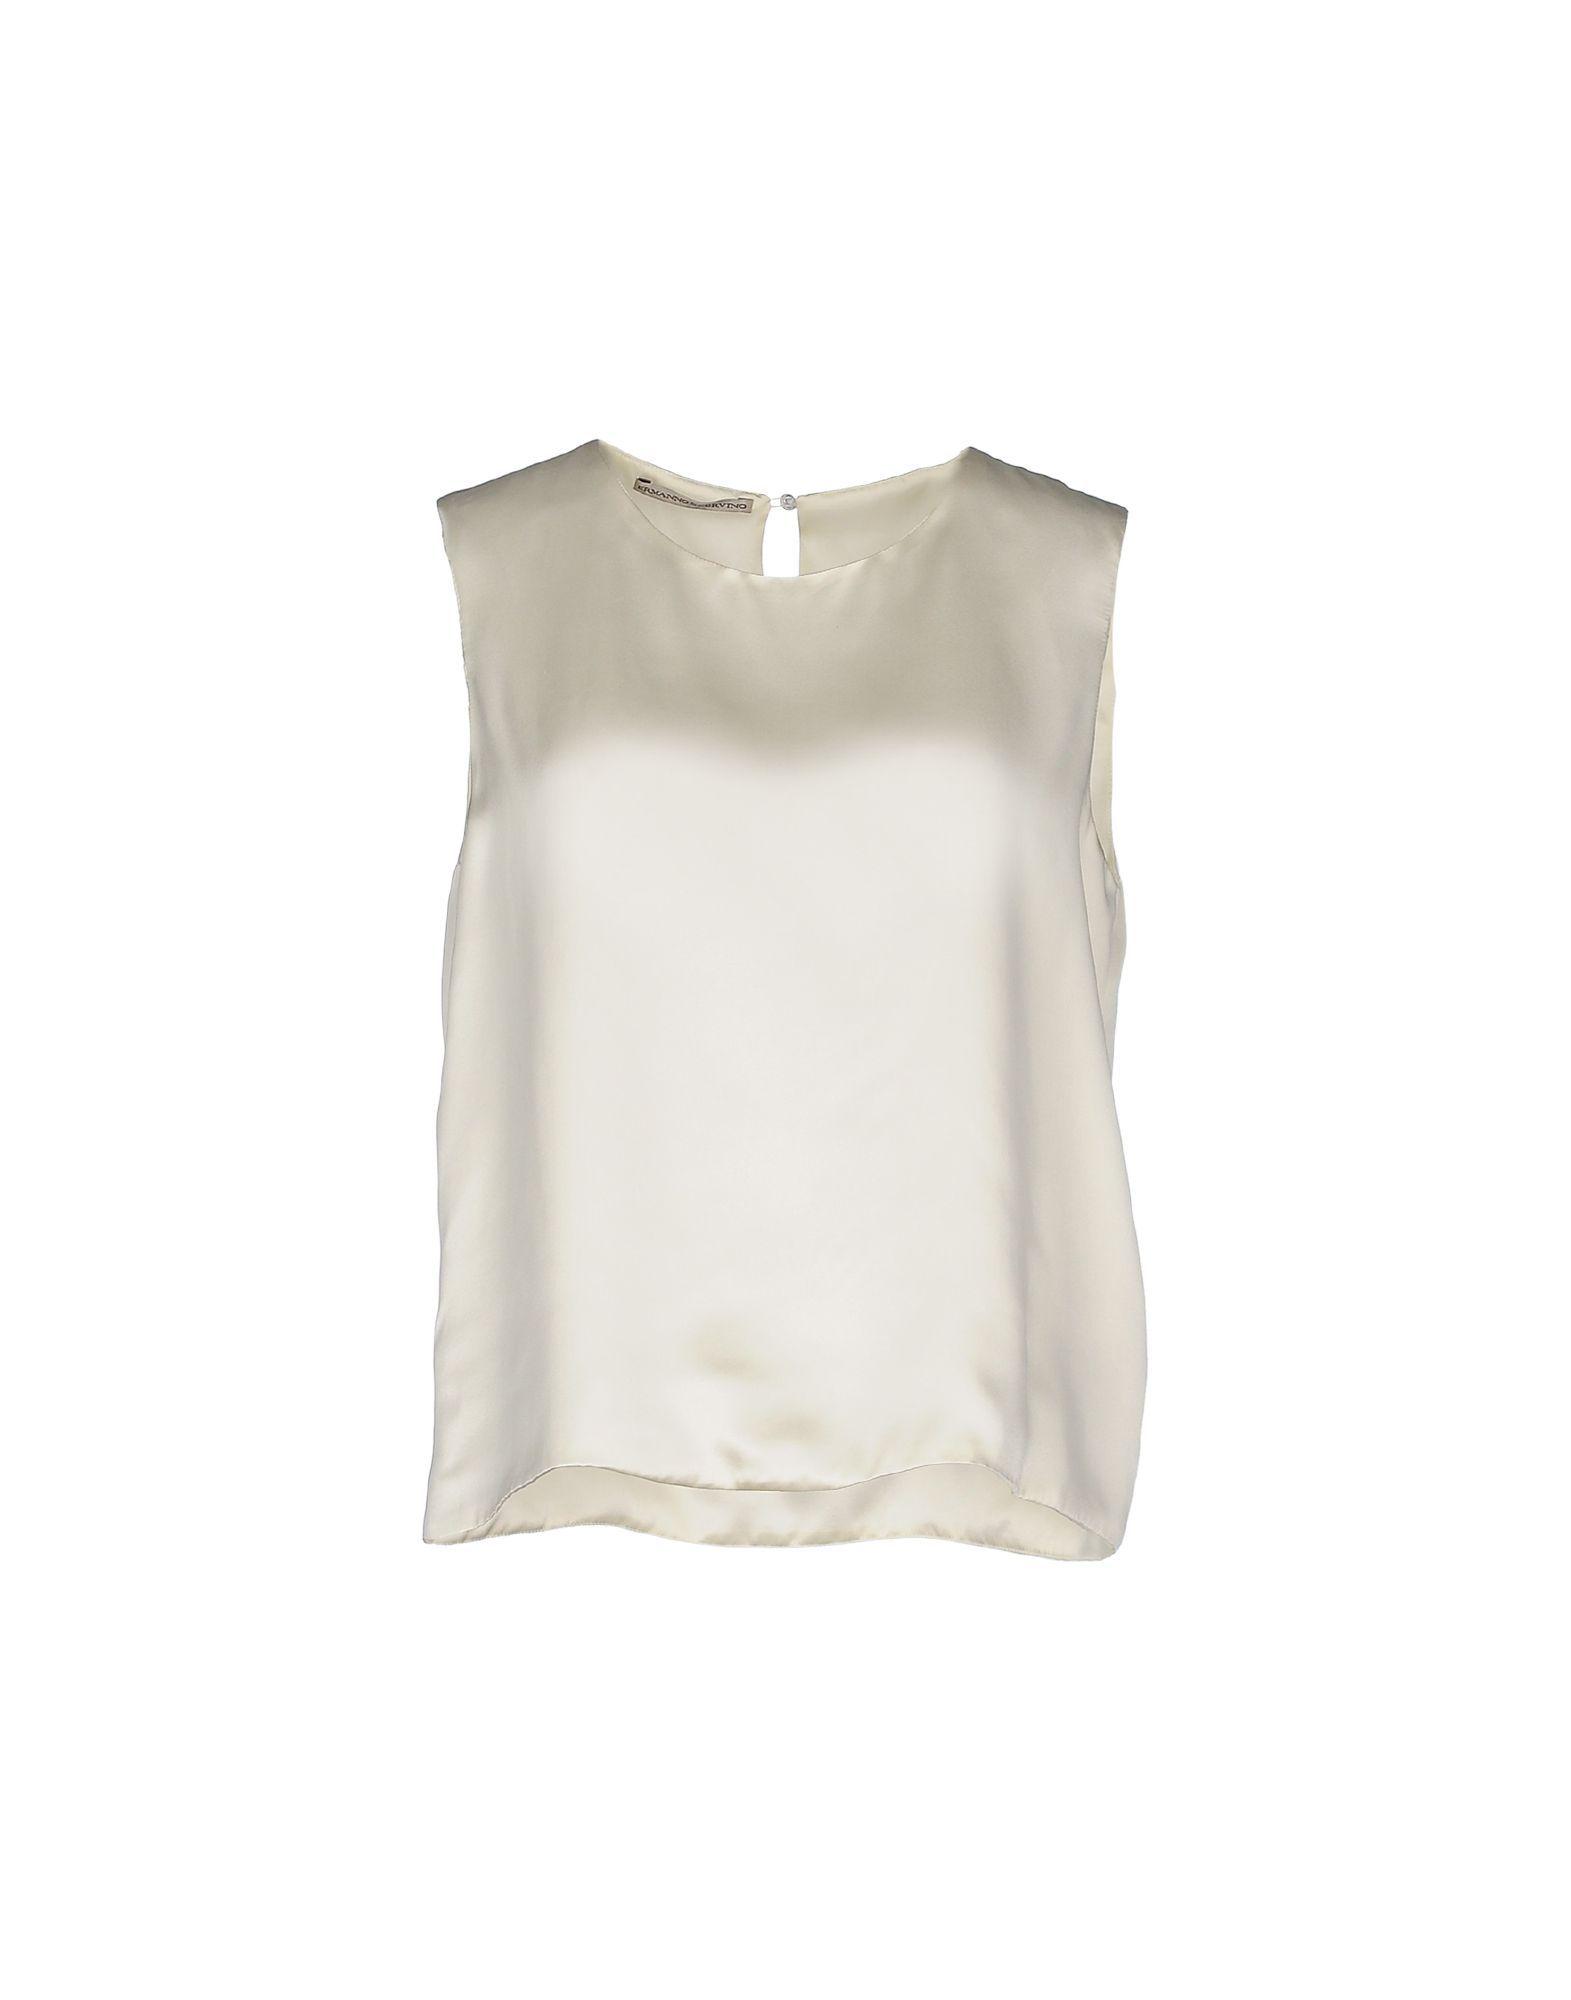 Ermanno Scervino Silk Top - Women Ermanno Scervino Silk Tops online on YOOX United States - 37793002SU